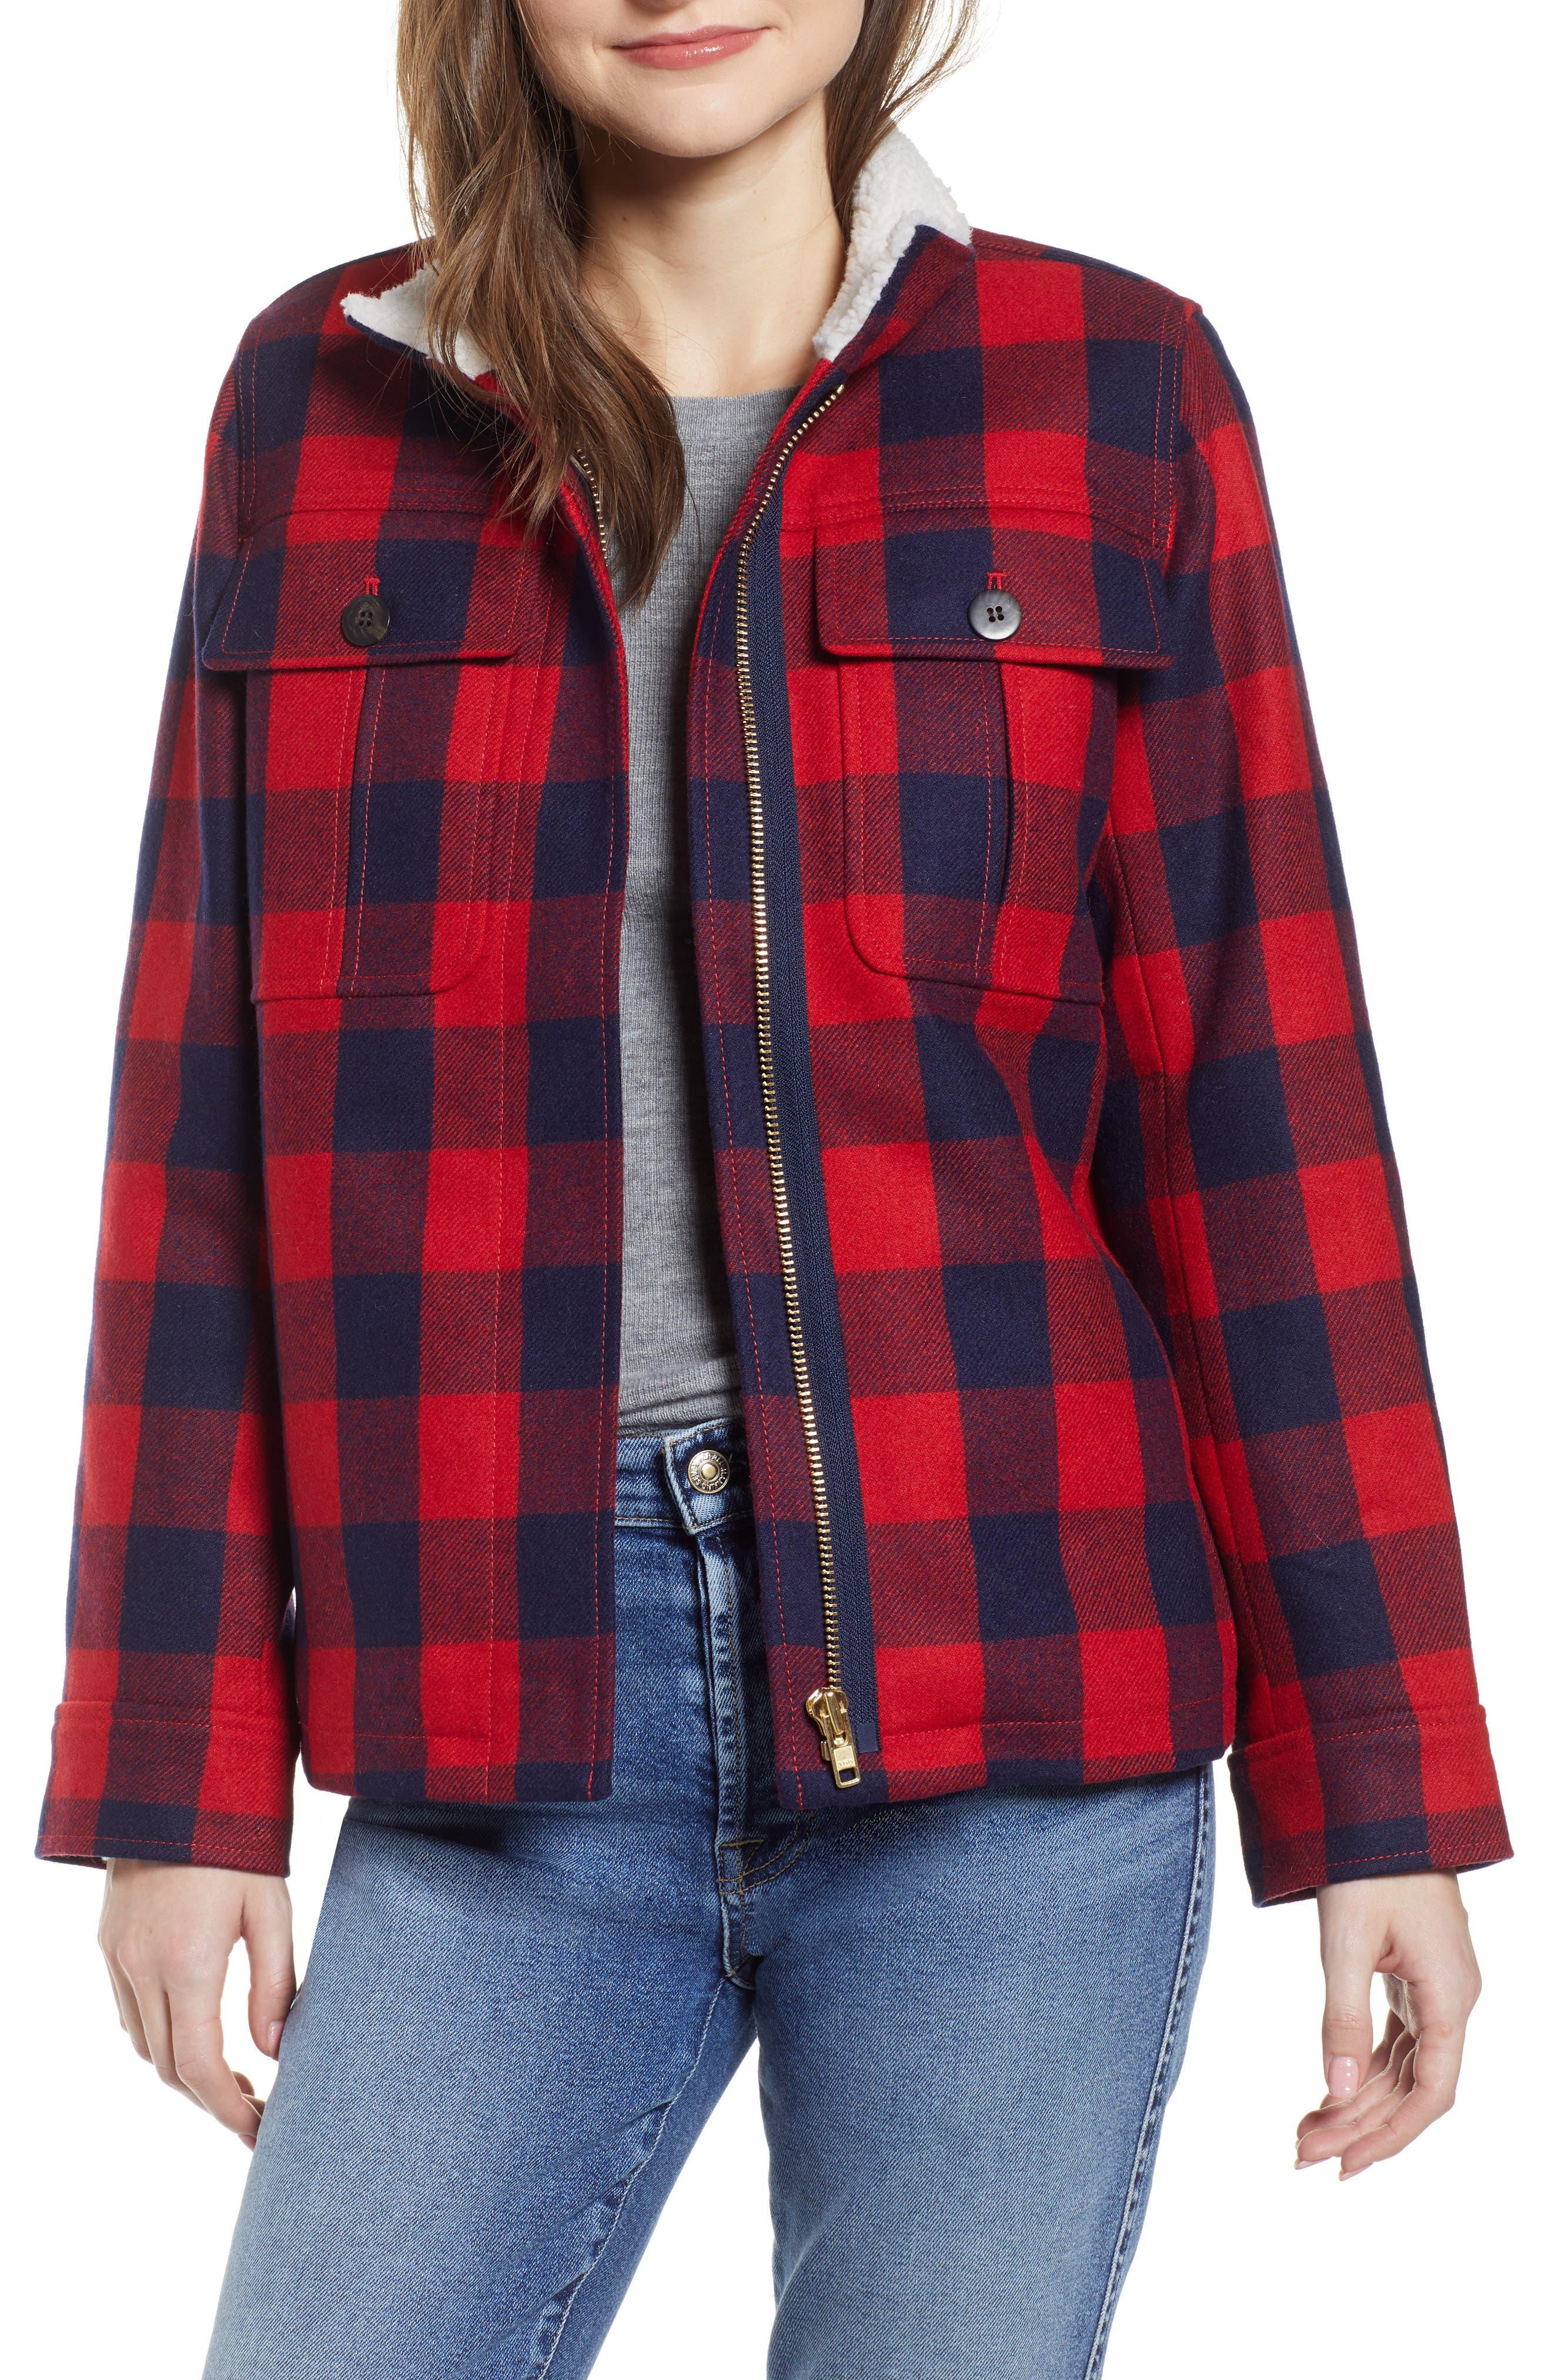 Buffalo Check Workwear Jacket with Faux Shearling Lining, Main, color, RED NAVY BUFFALO